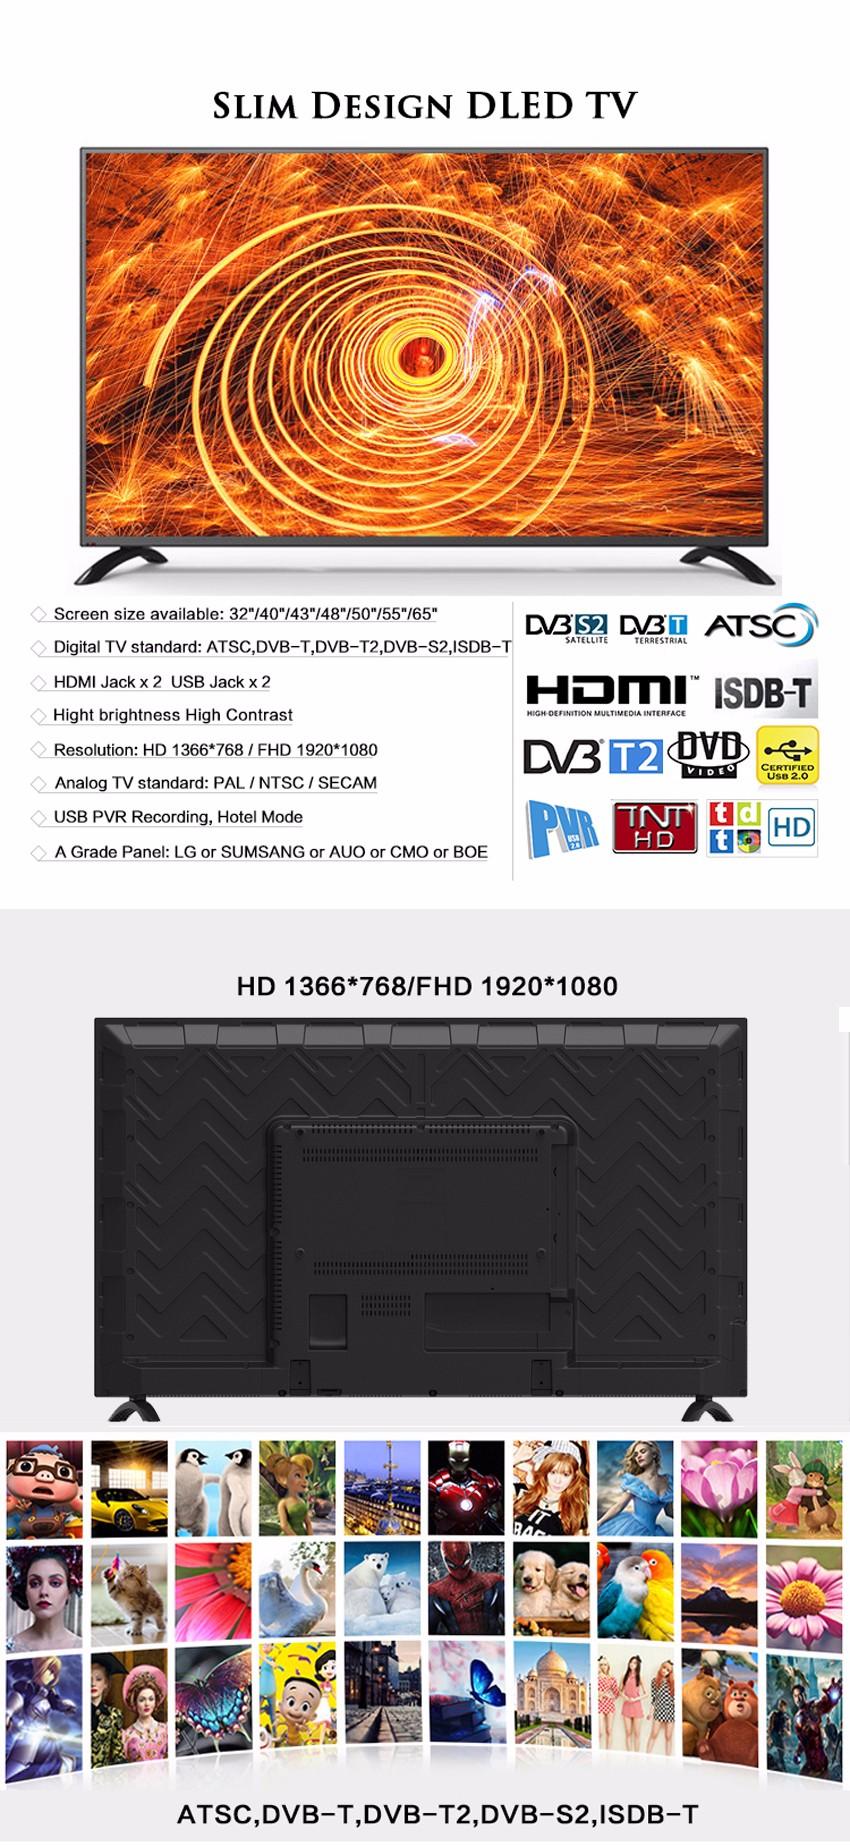 lg tv 75 inch. 2017 murah layar datar hd led tv lcd, cina 32 40 42 50 65 75 lg tv inch